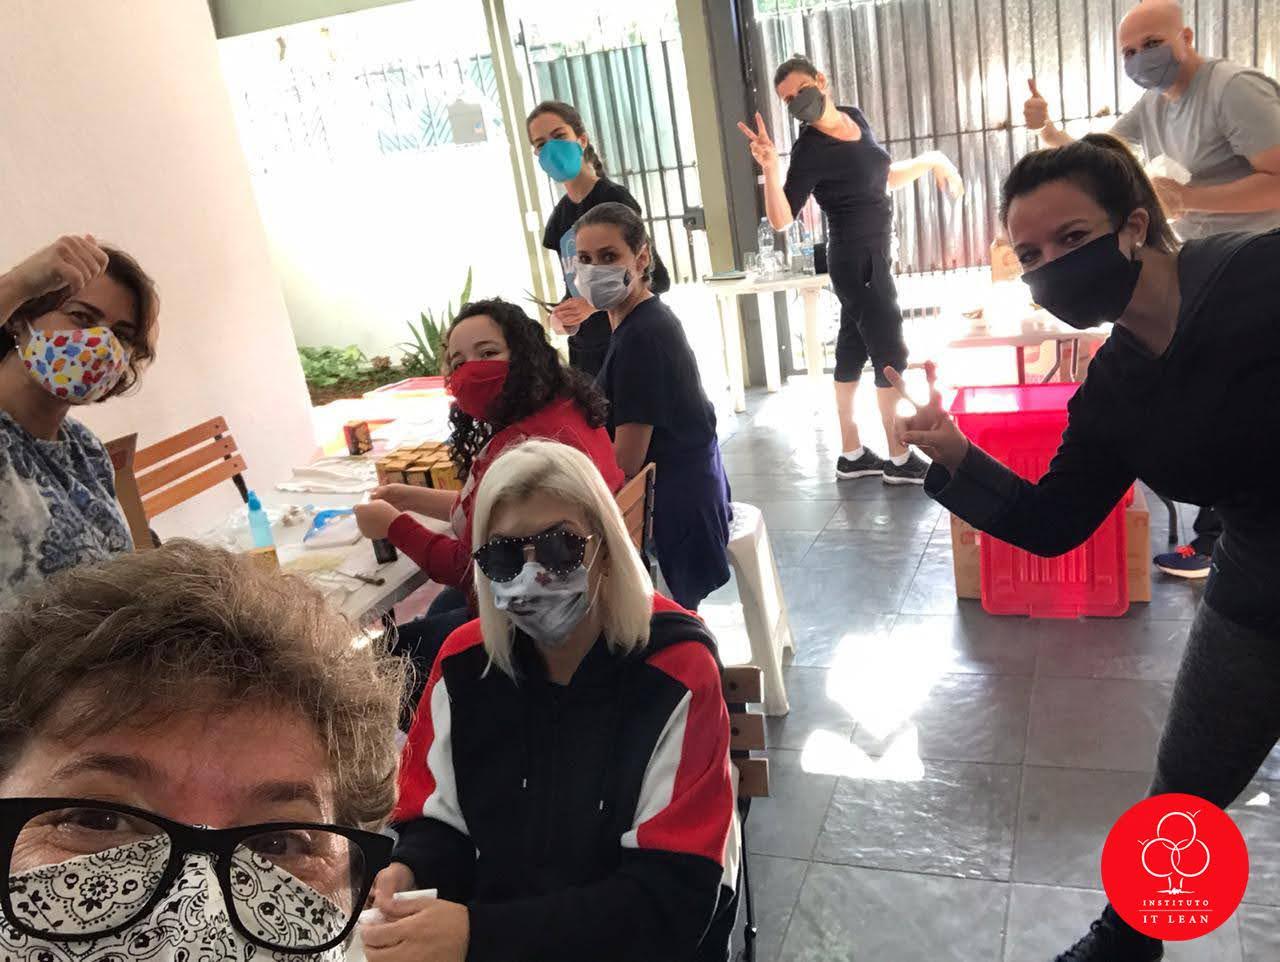 Cafe-manha-Instituto-it-lean-doacao-sao-paulo-7.jpg